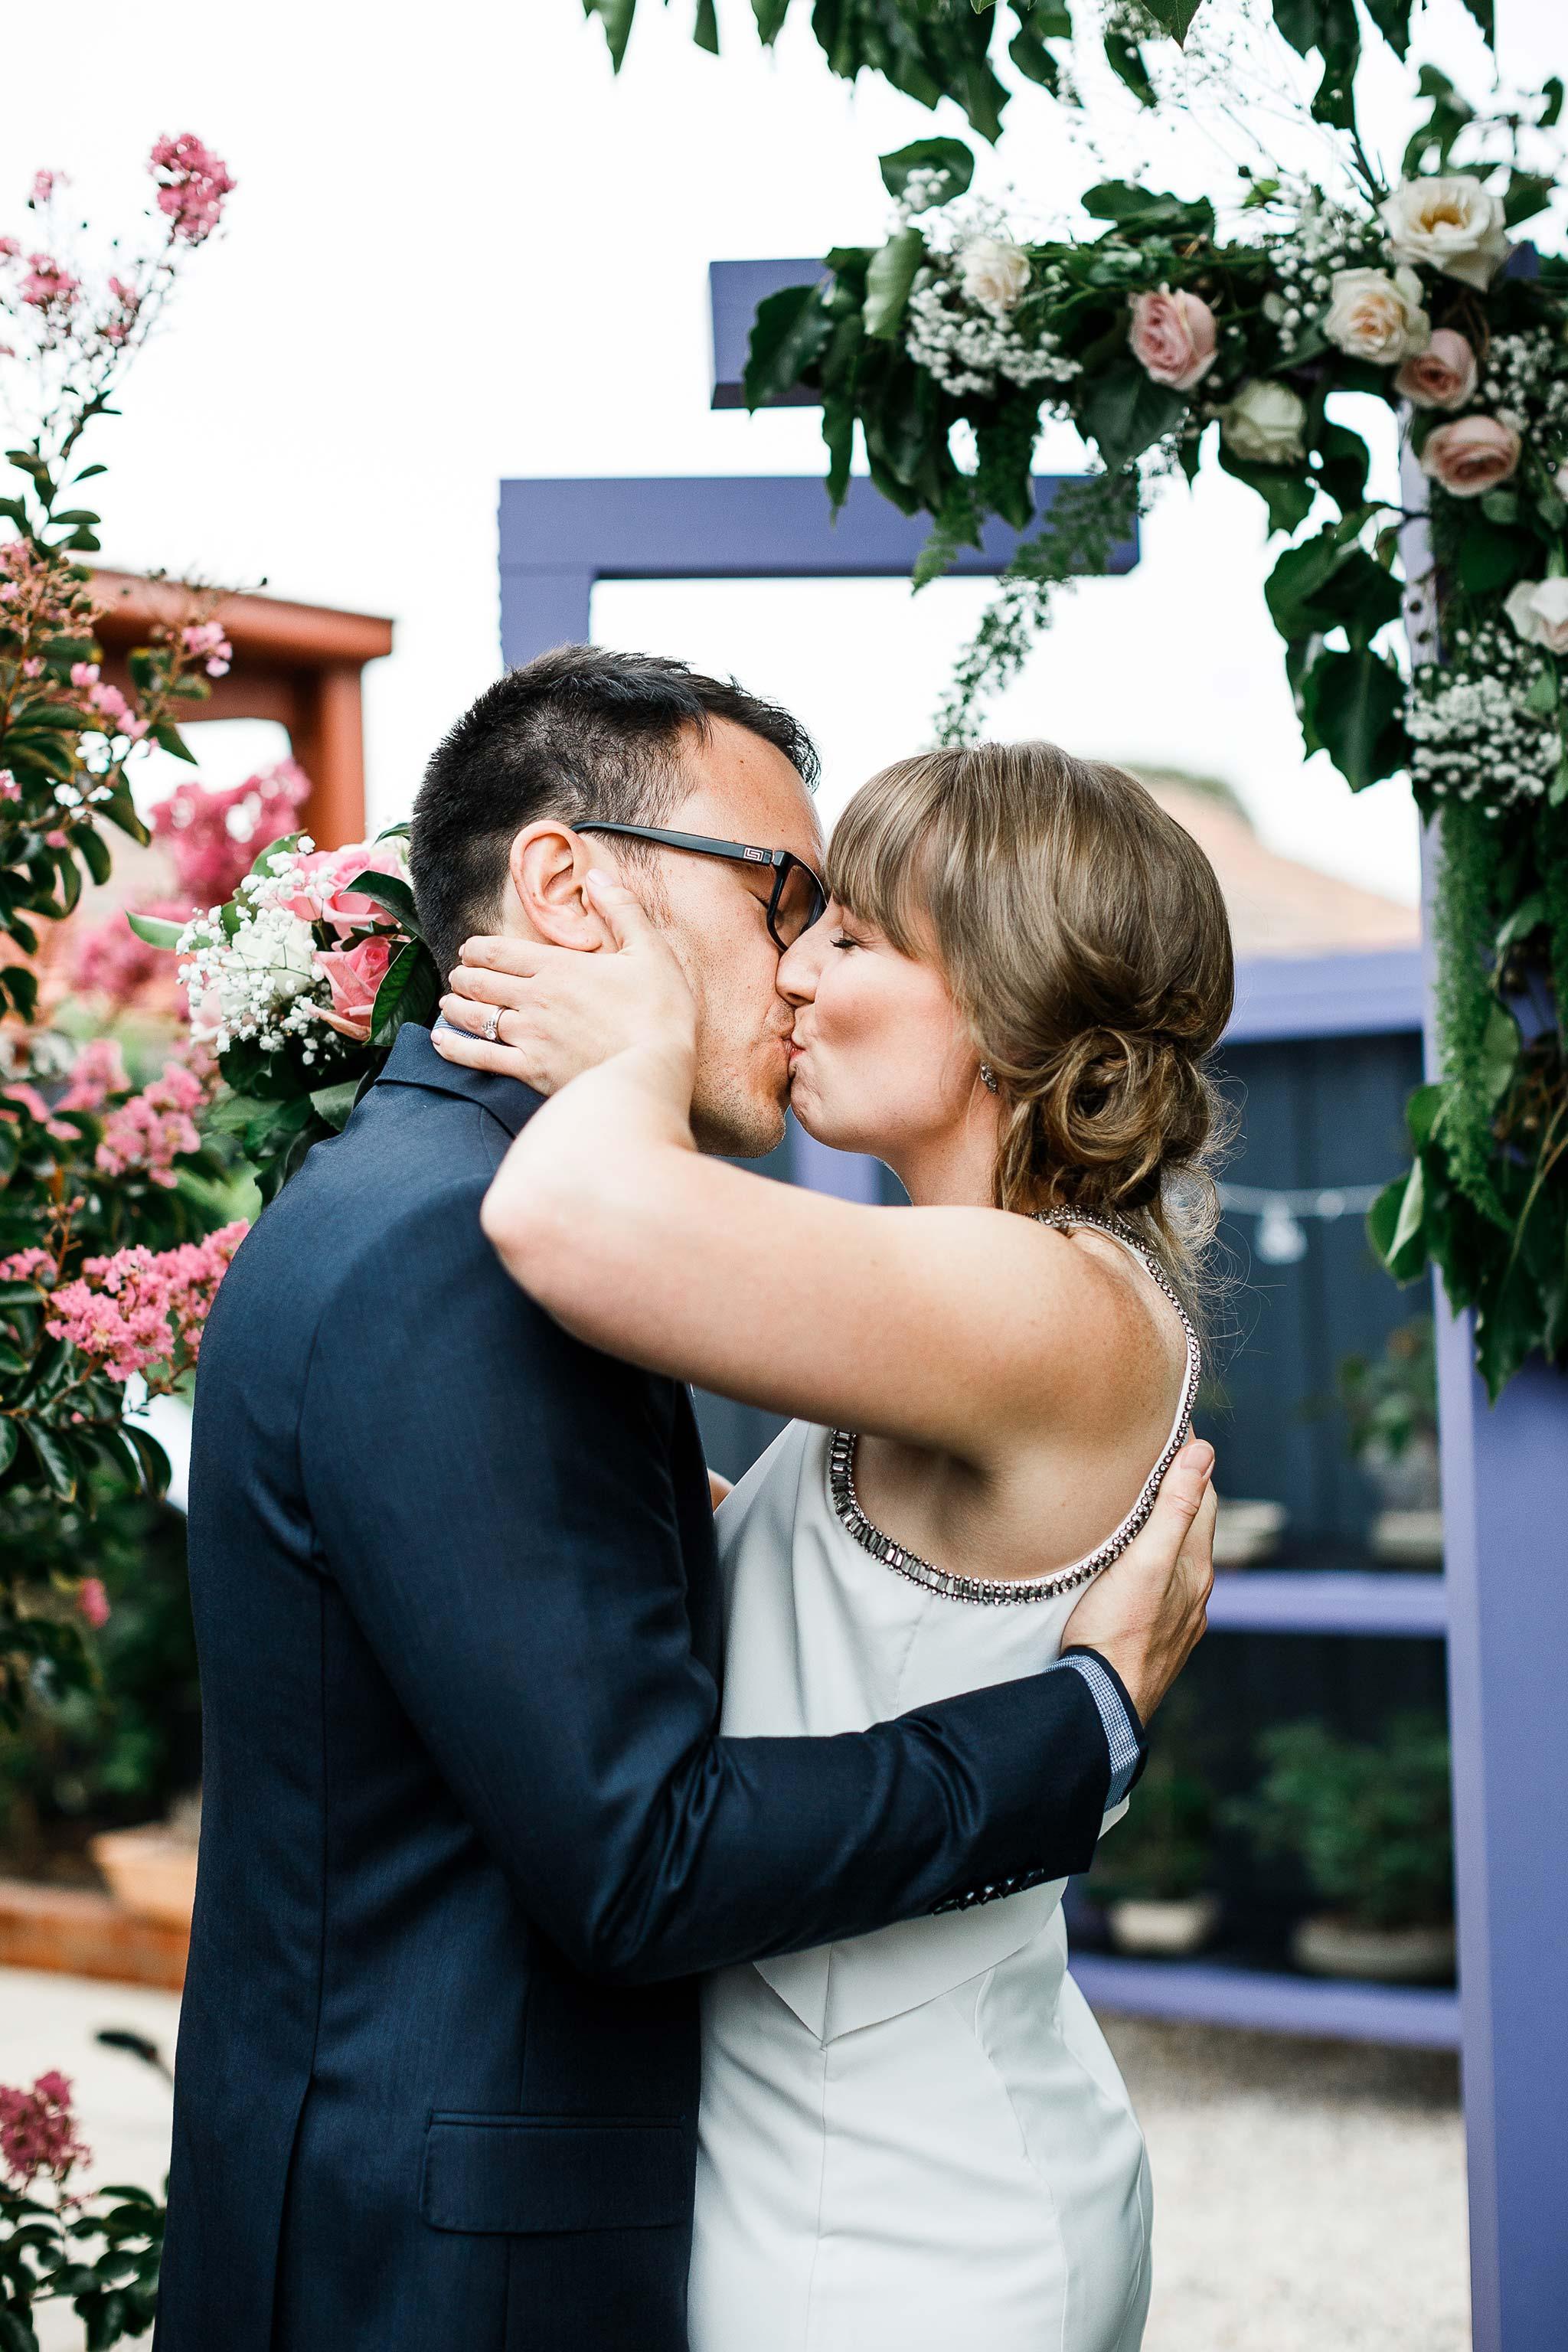 Strathmore-Melbourne-Backyard-Wedding-ceremony-kiss